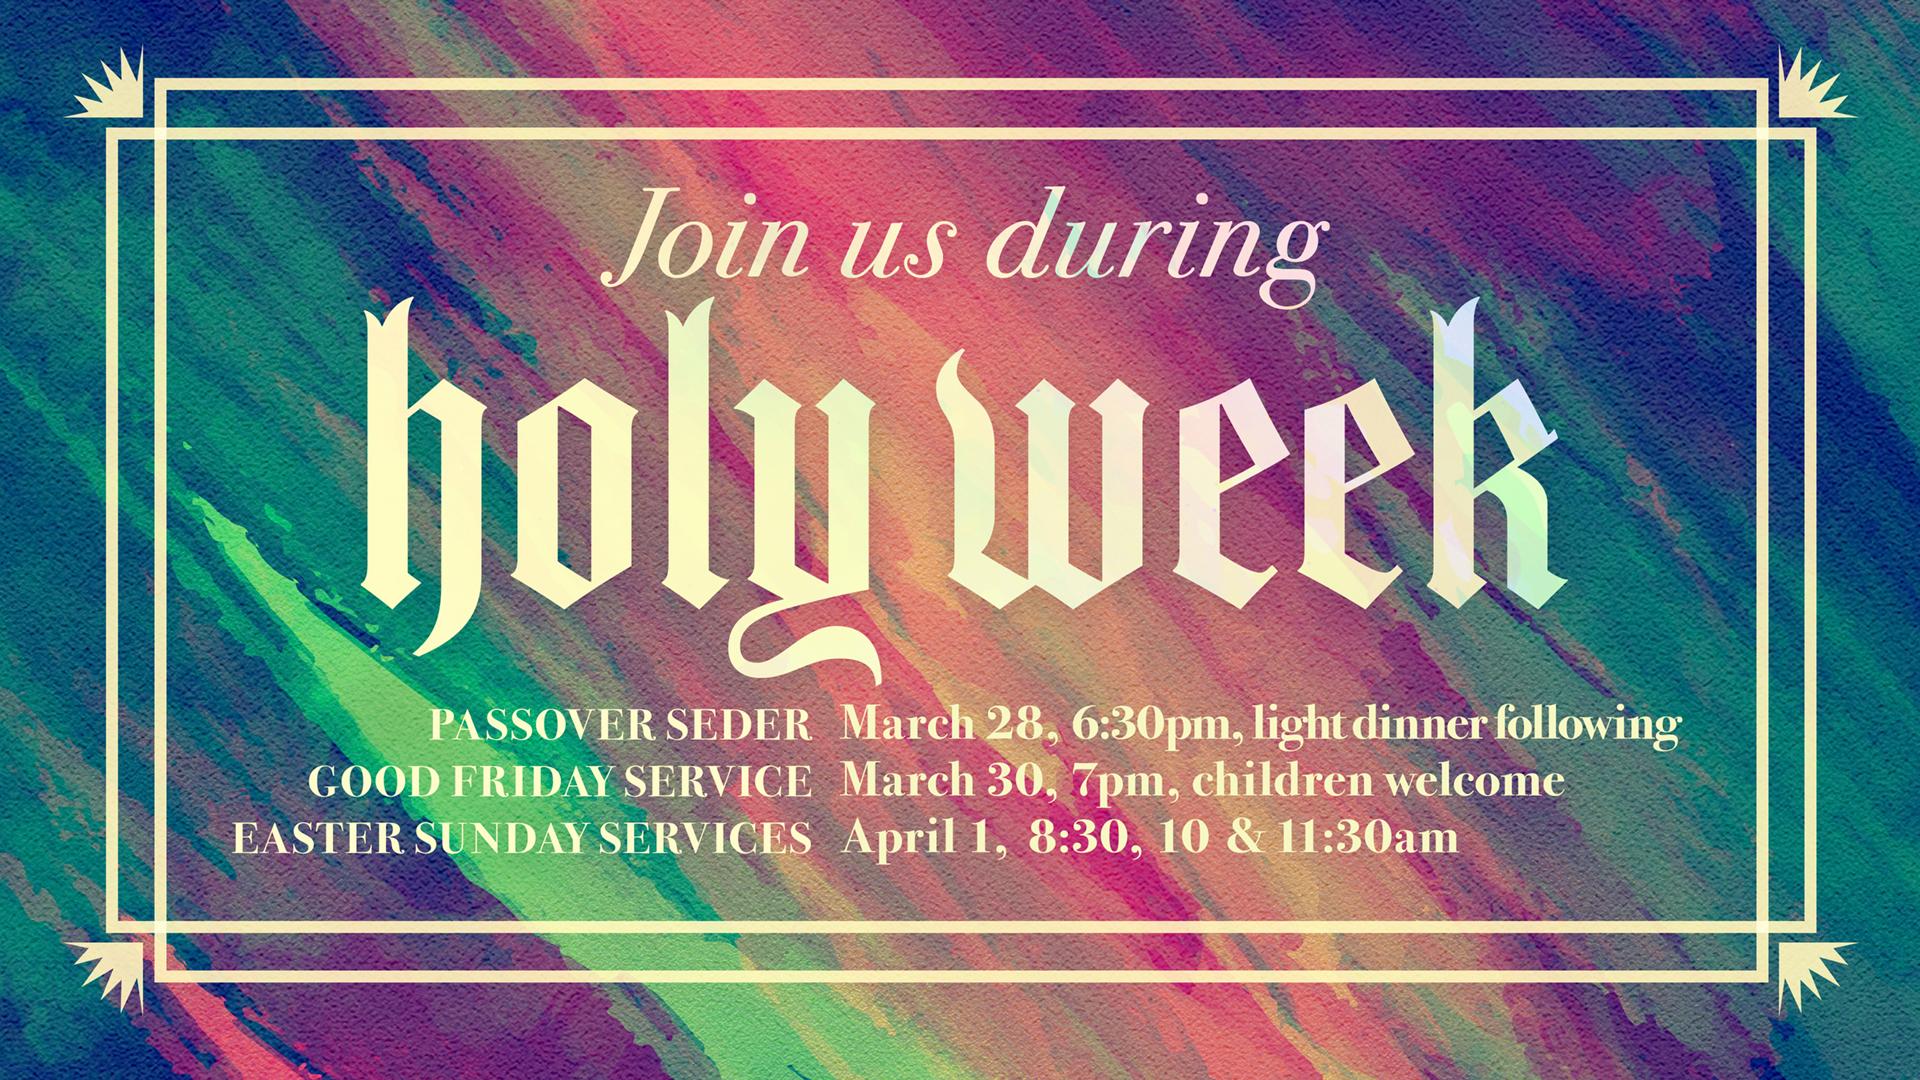 Saratoga-Holy Week Events